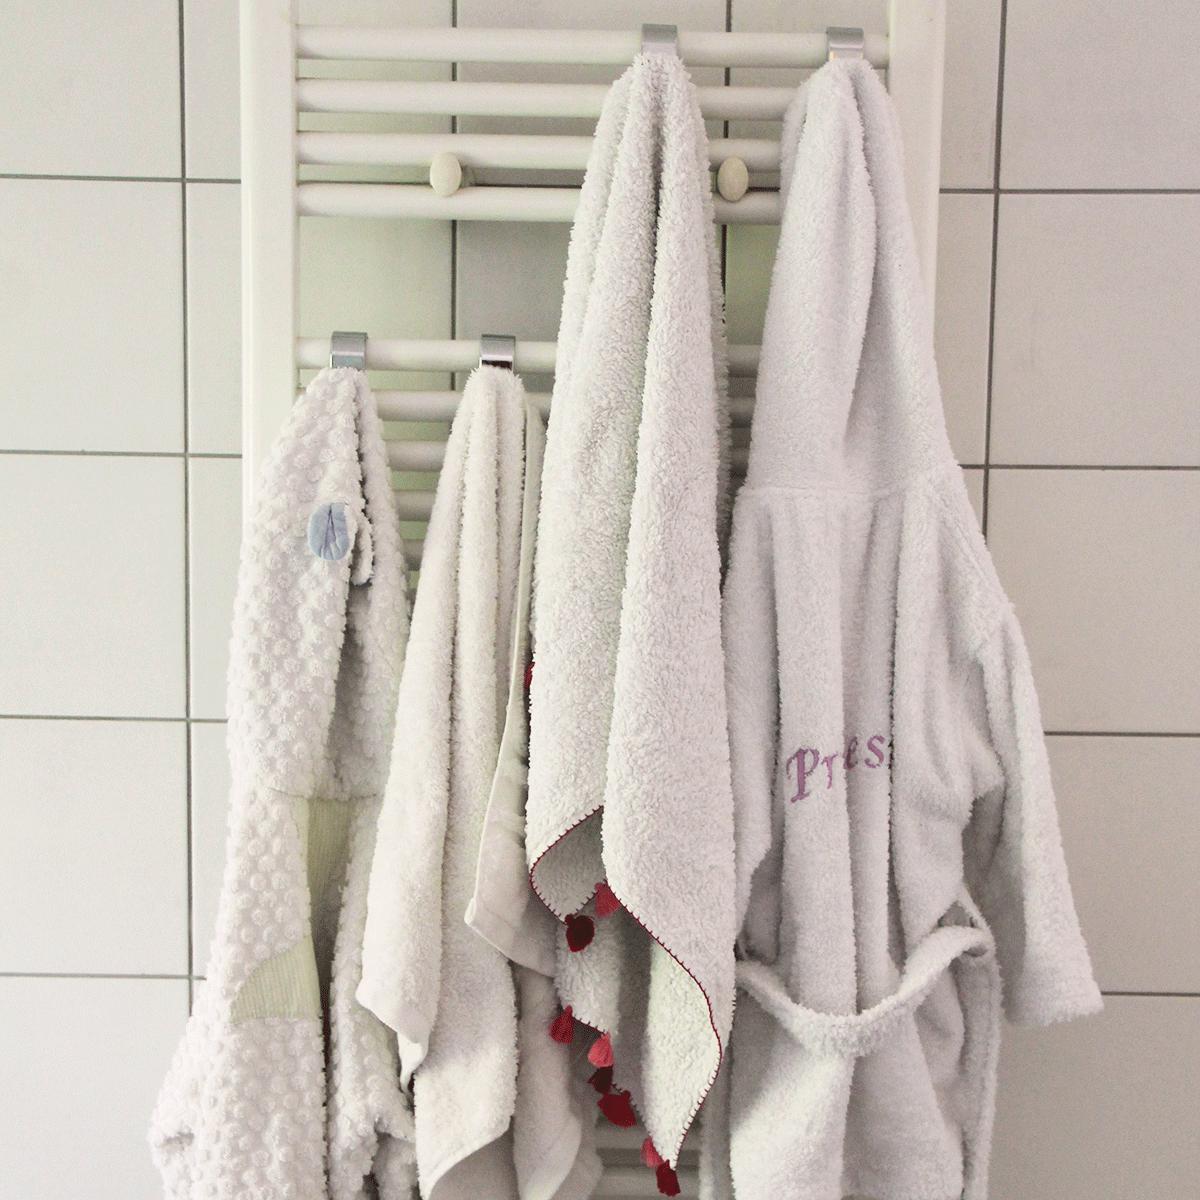 4 crochets suspendre sur s che serviette. Black Bedroom Furniture Sets. Home Design Ideas